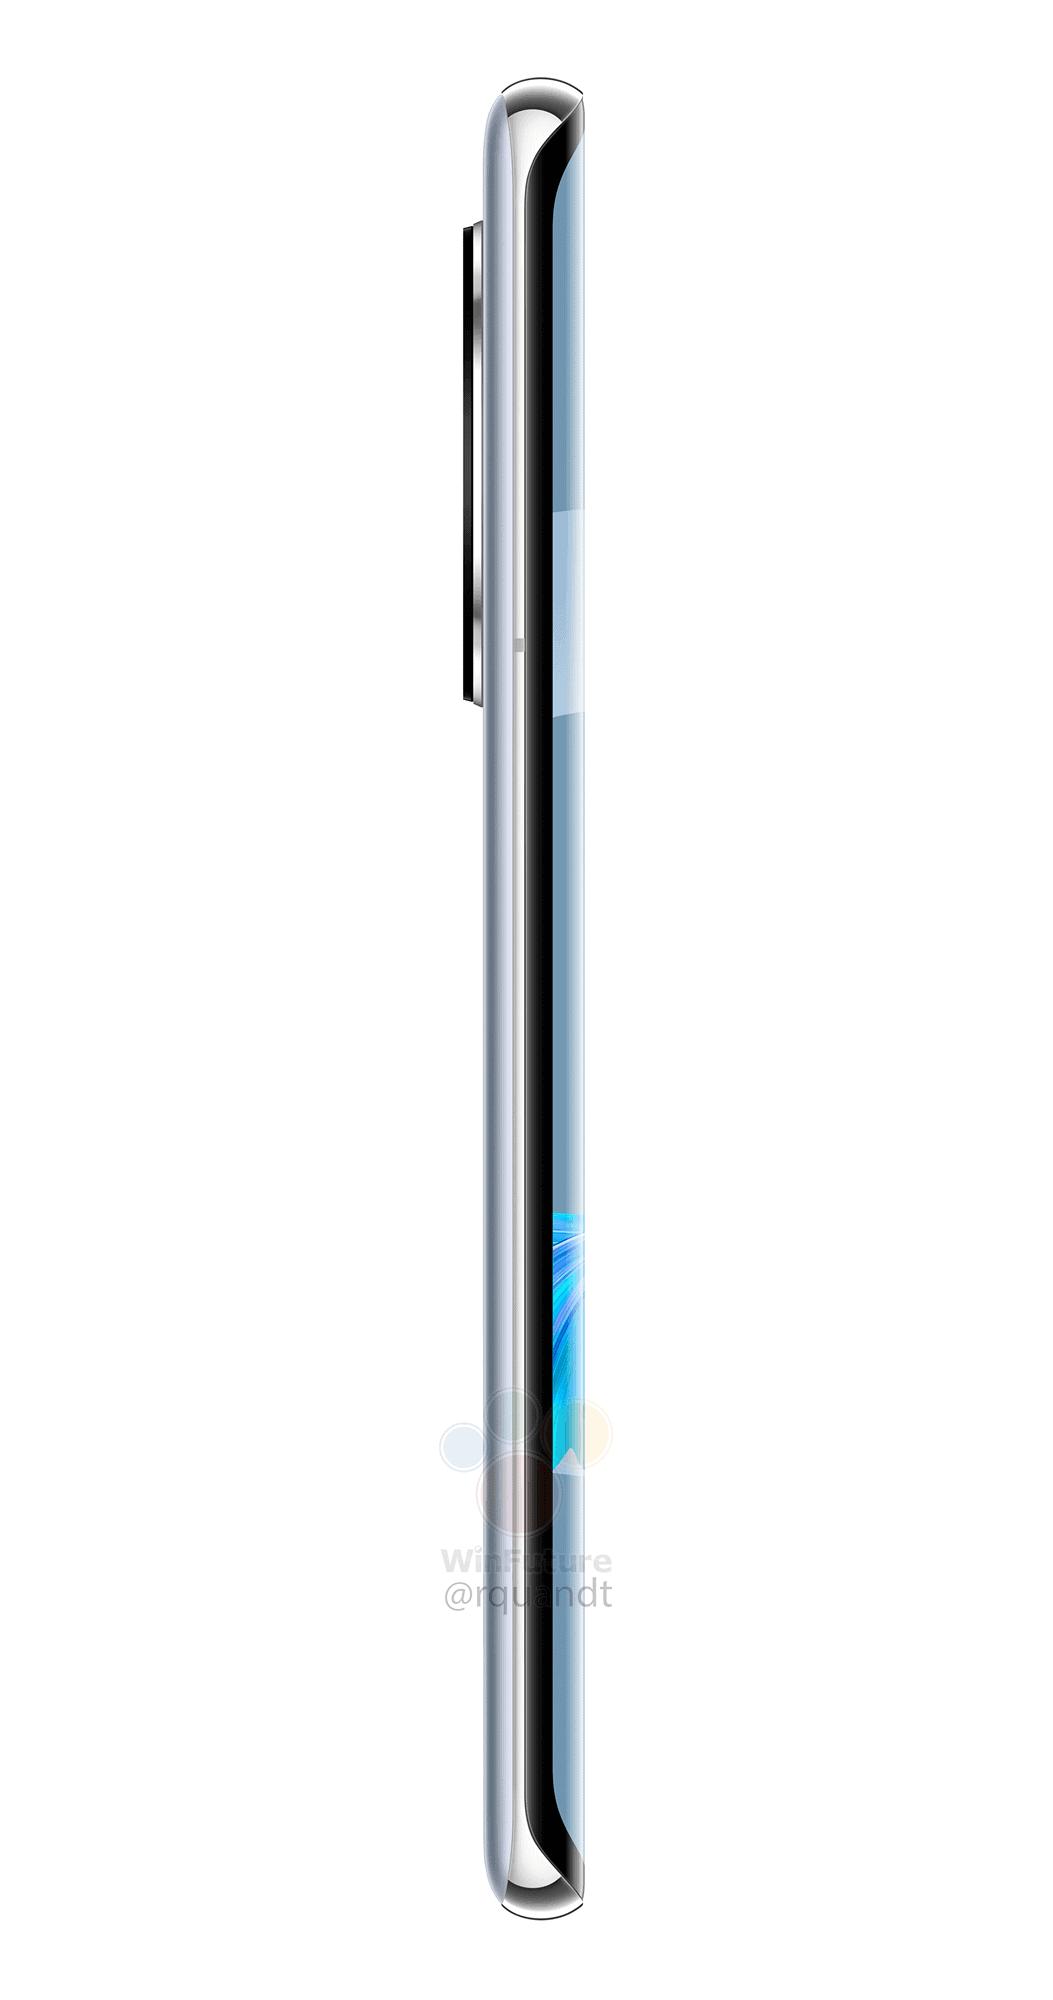 Huawei Mate 40 Pro leak 10